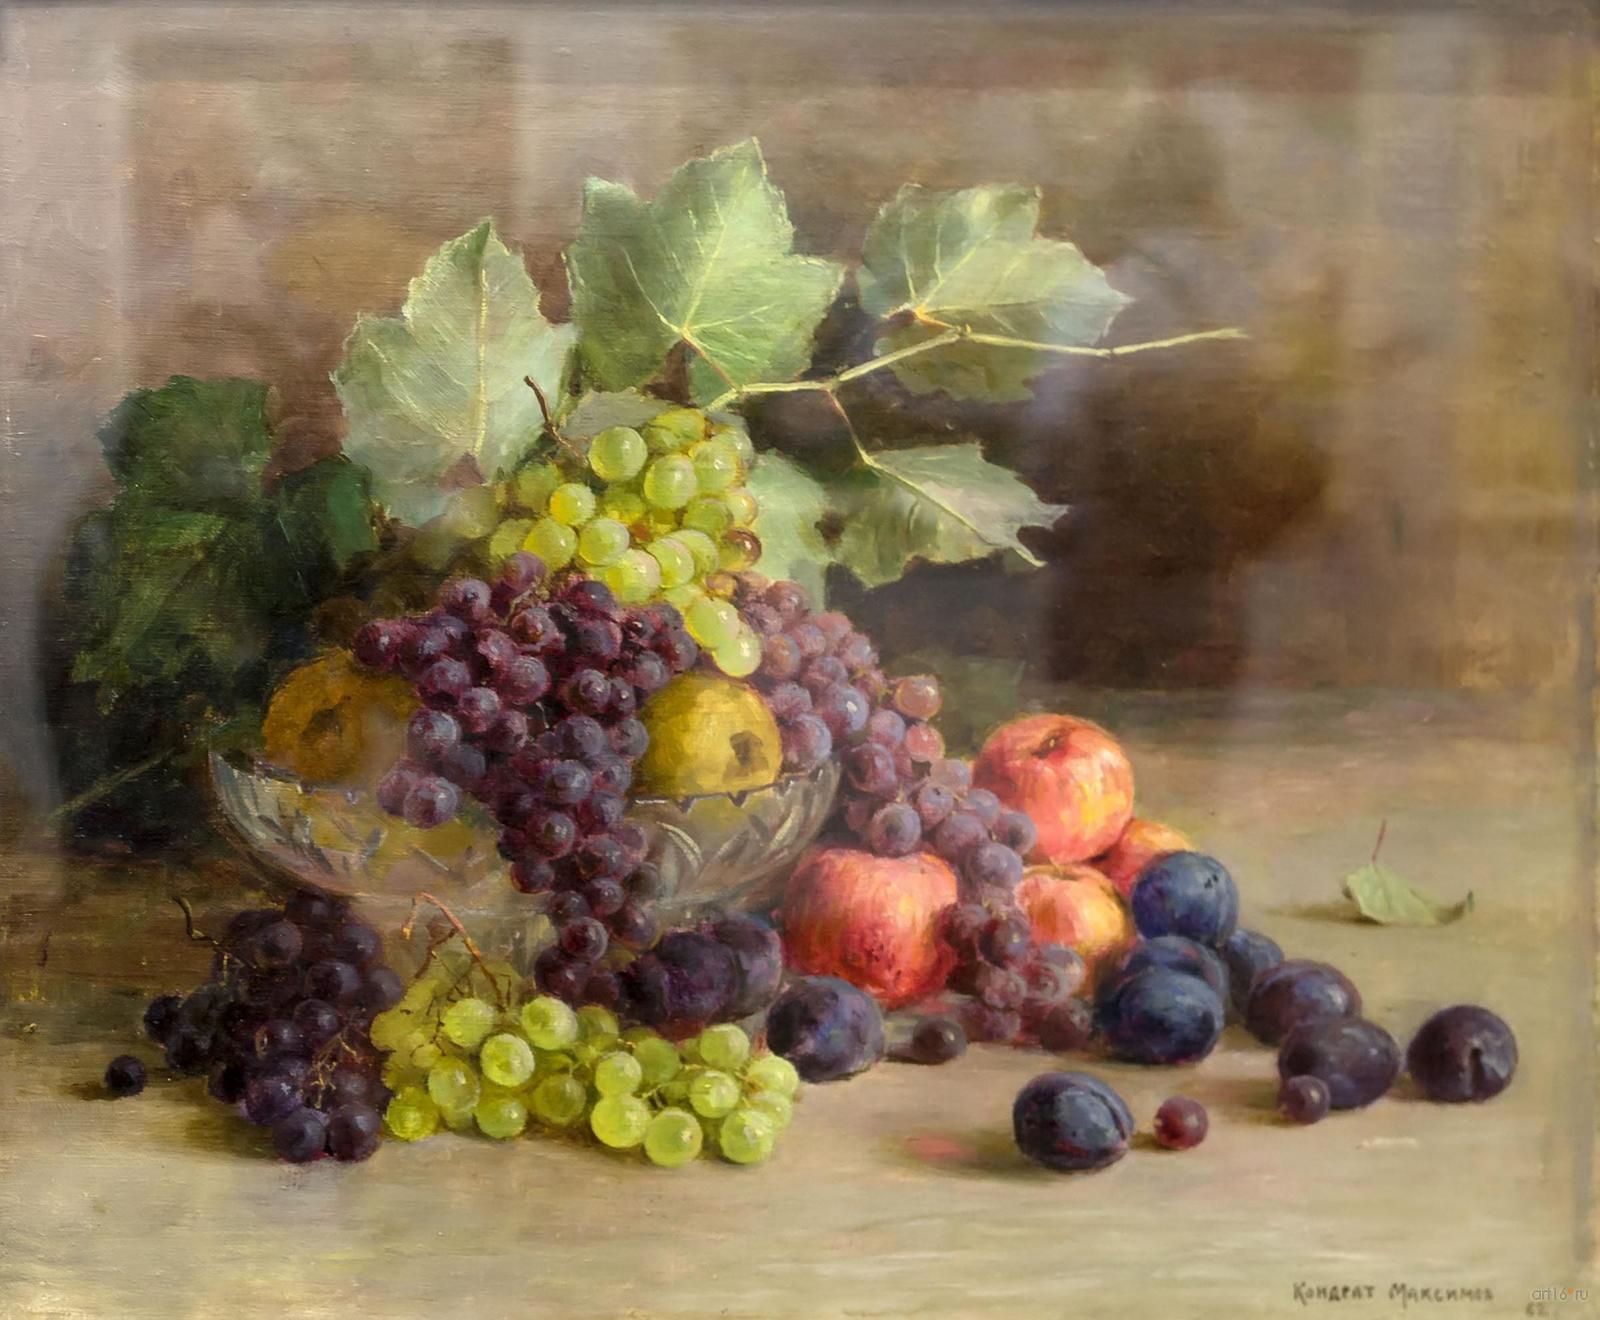 Фото №861079. Натюрморт с виноградом. 1962. Максимов Кондрат \Евдокимович. 1894-1981